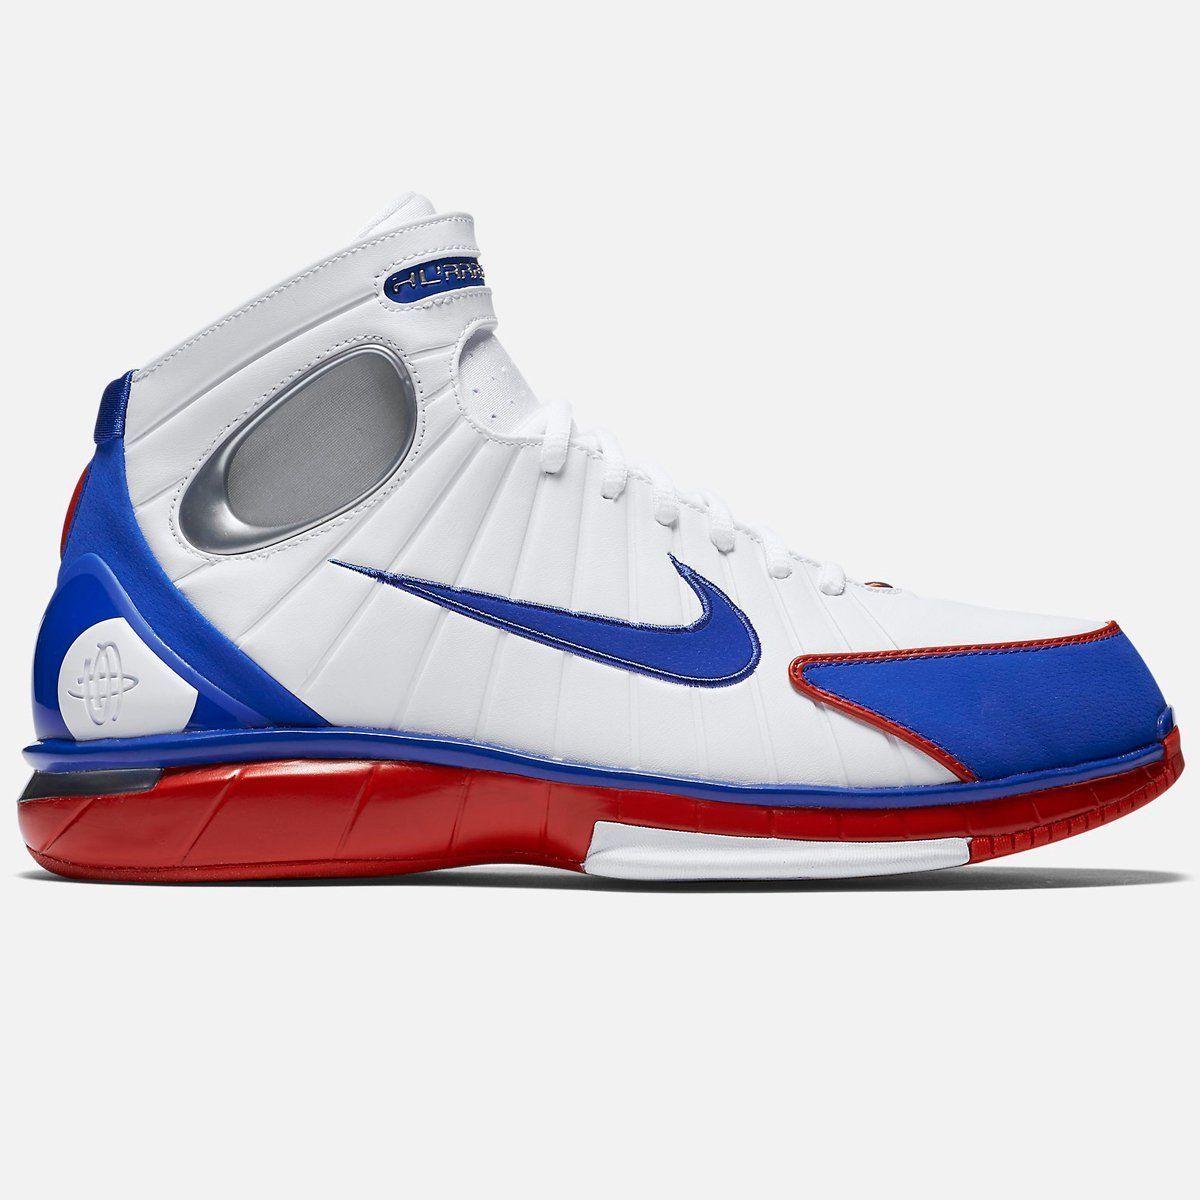 Men's Nike Air Zoom Huarache 2K4 308475-100 Kobe All Star Game ASG USA Sz